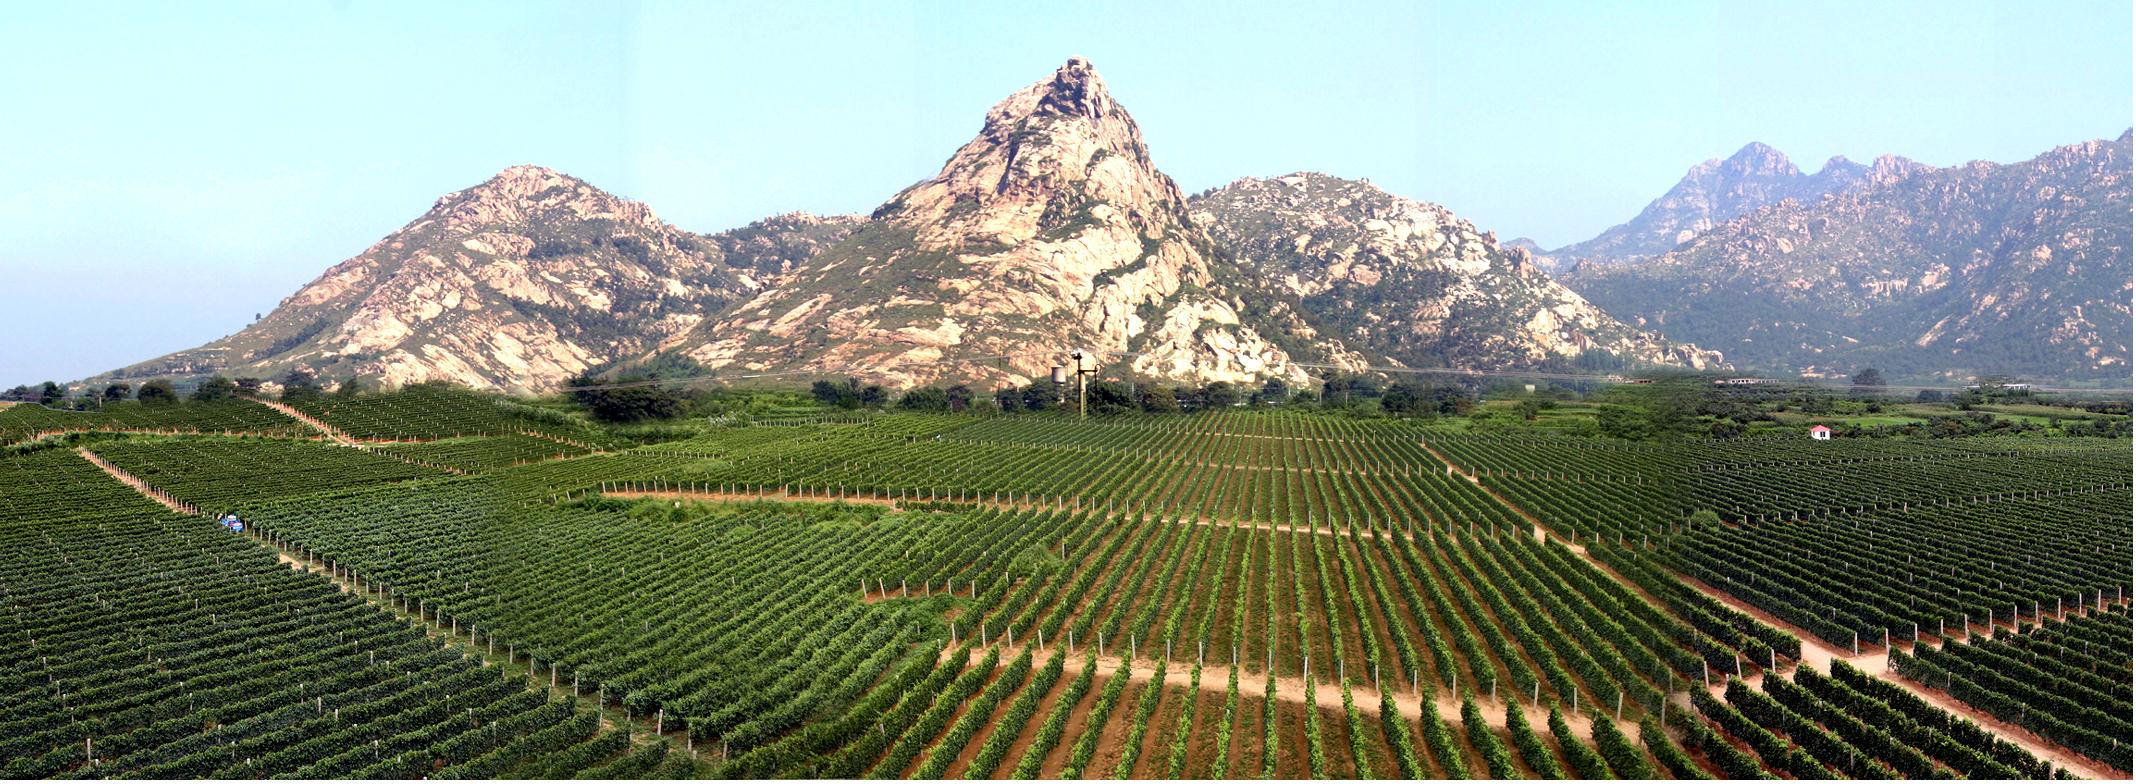 Pheonix Hill Vineyard - Changli County, Hebei